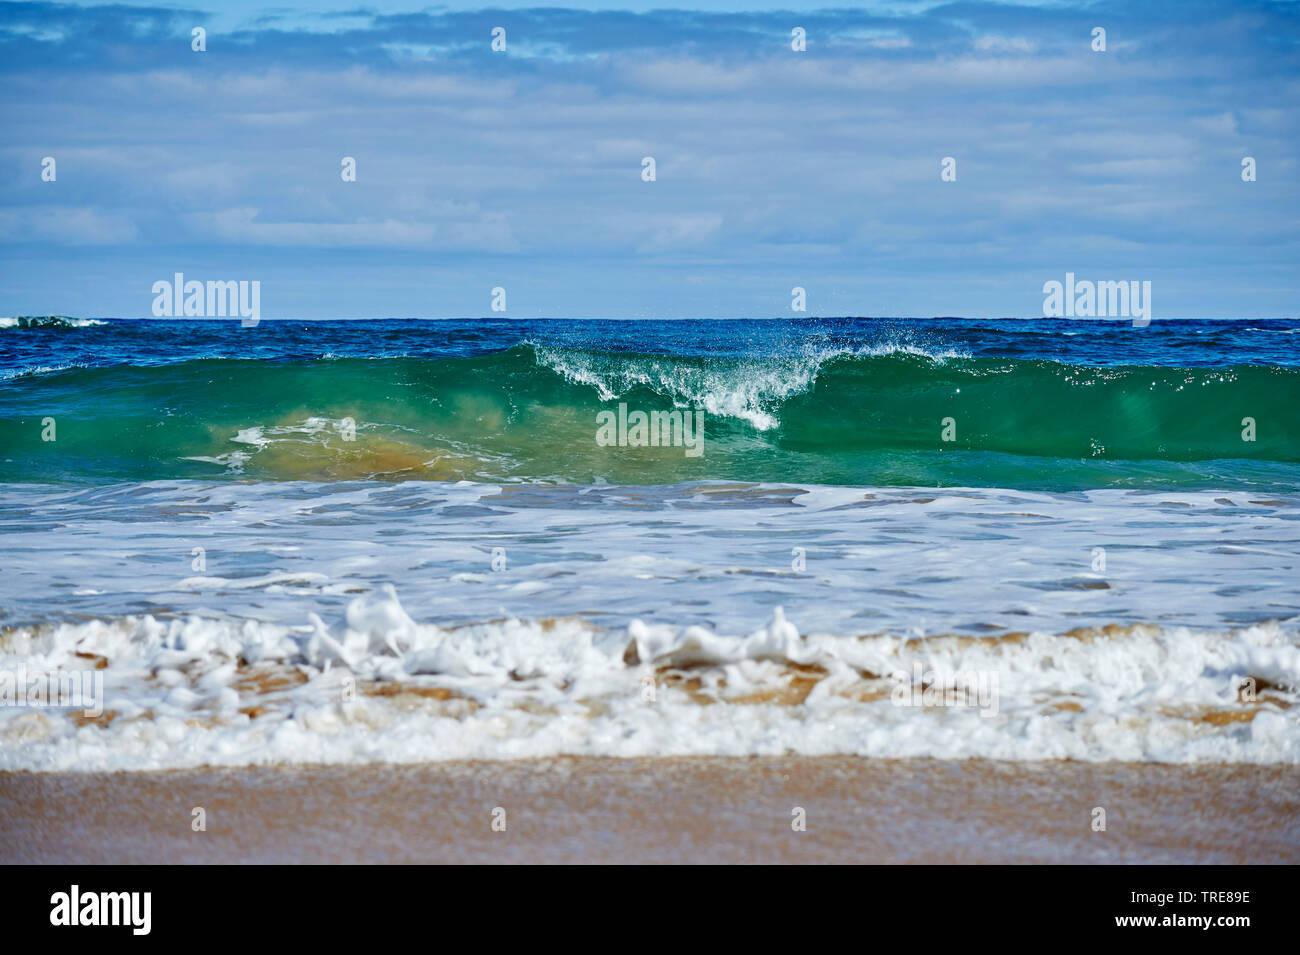 Meeresbrandung, Australien, Victoria | breaking waves at the sea, Australia, Victoria | BLWS519823.jpg [ (c) blickwinkel/D. u. M. Sheldon Tel. +49 (0) - Stock Image